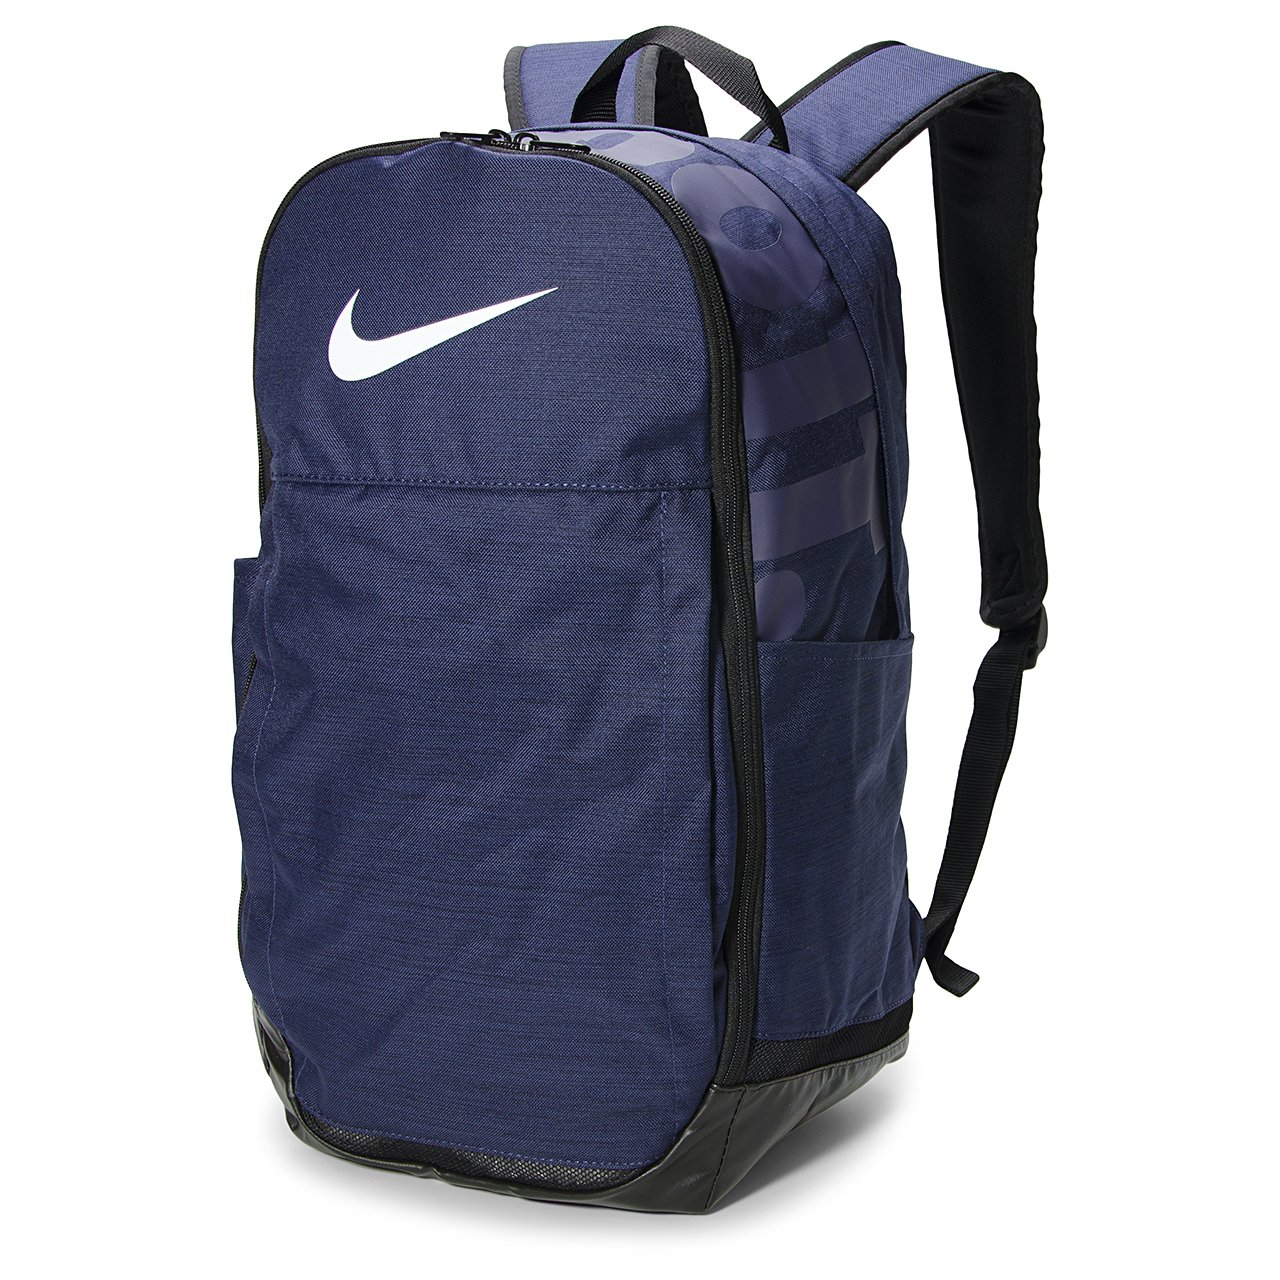 Nike Unisex Nk Brsla XL Bkpk Rucksack, Schwarz, 15x24x45 Centimeters